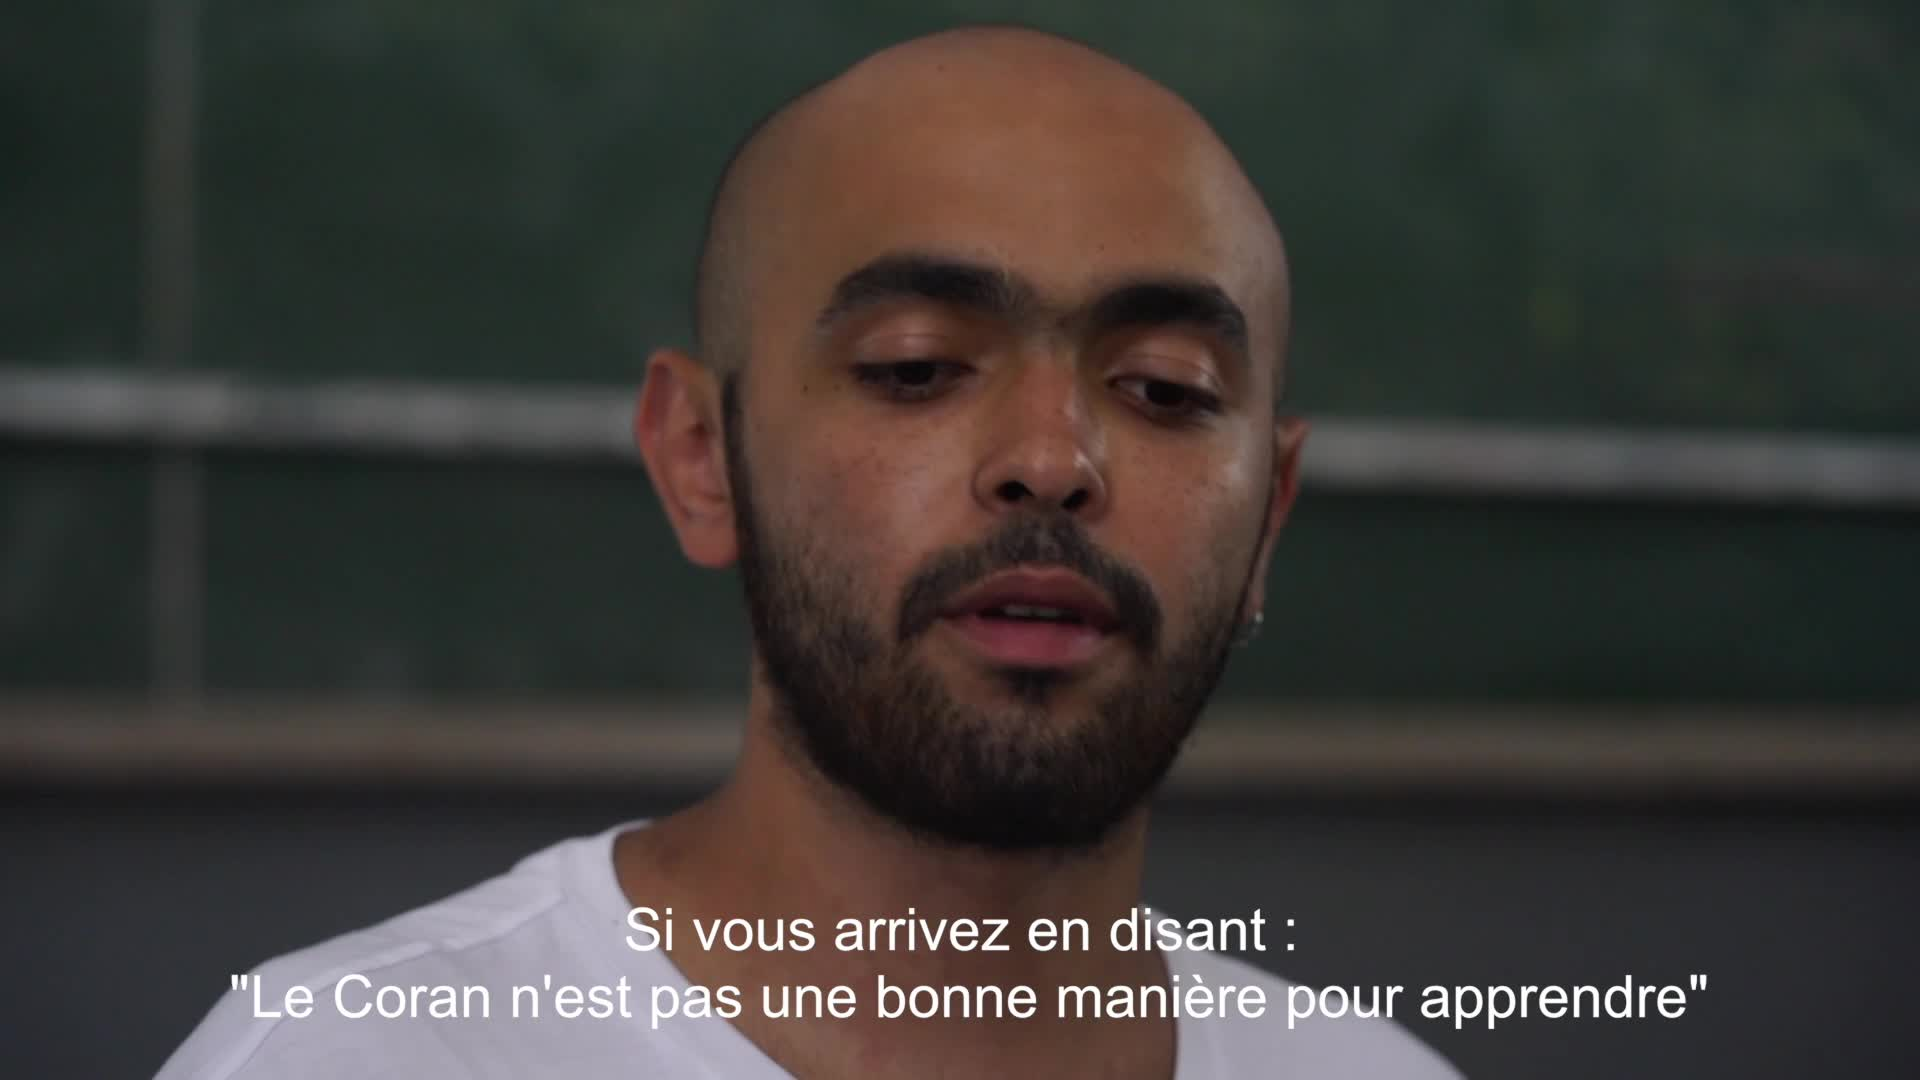 Vidéo Jeunes reporters culture - Le cri de la liberté